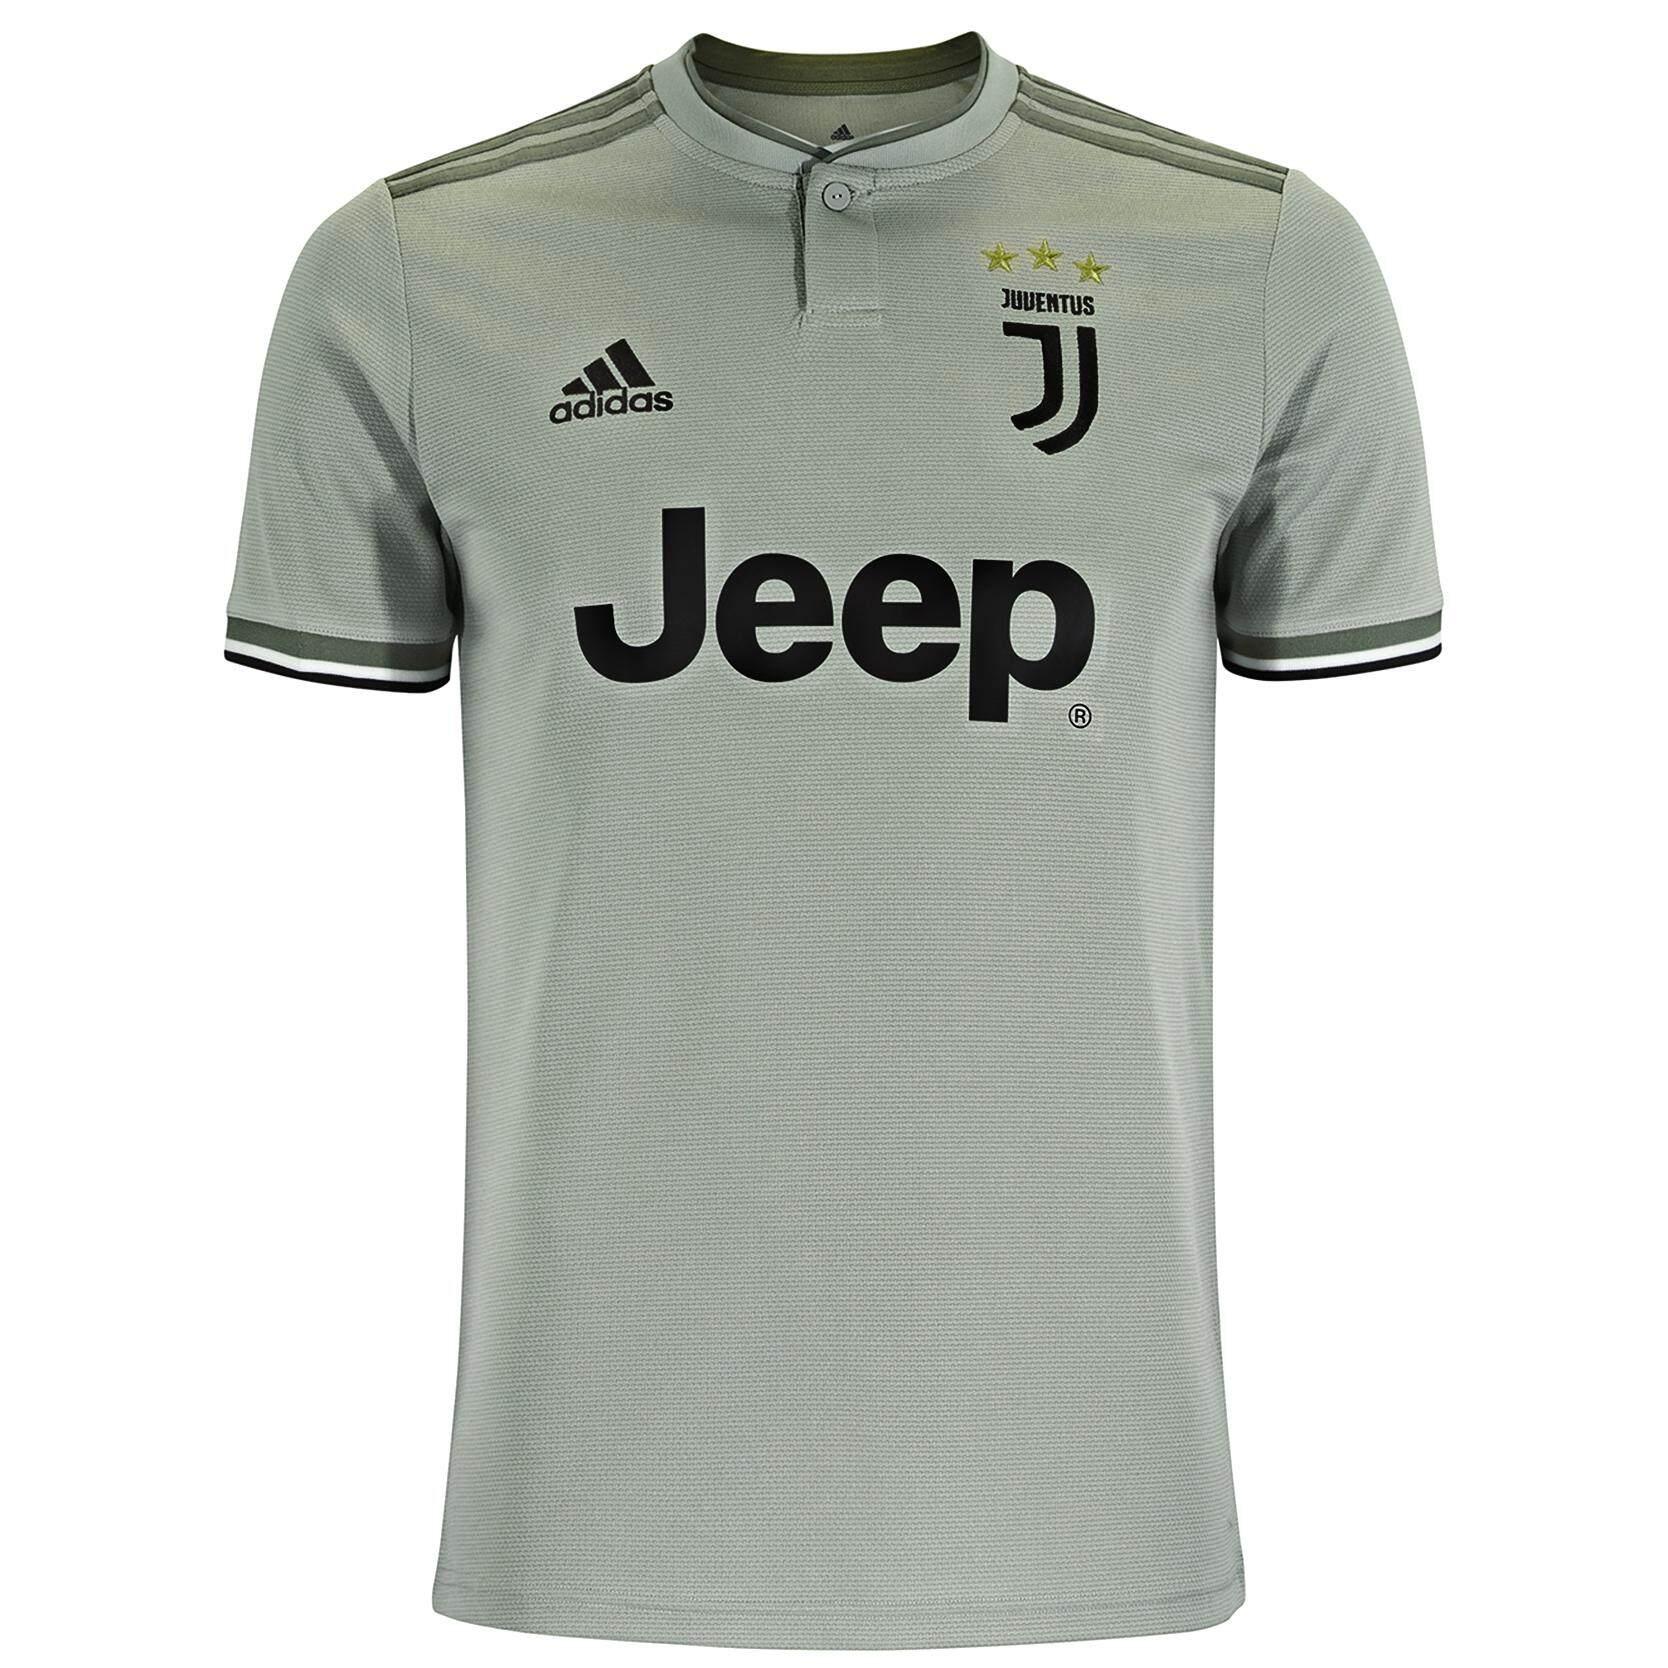 buy popular 627a3 e3d22 Juventus Away Jersey 2018/19 for Men Italian Serie A